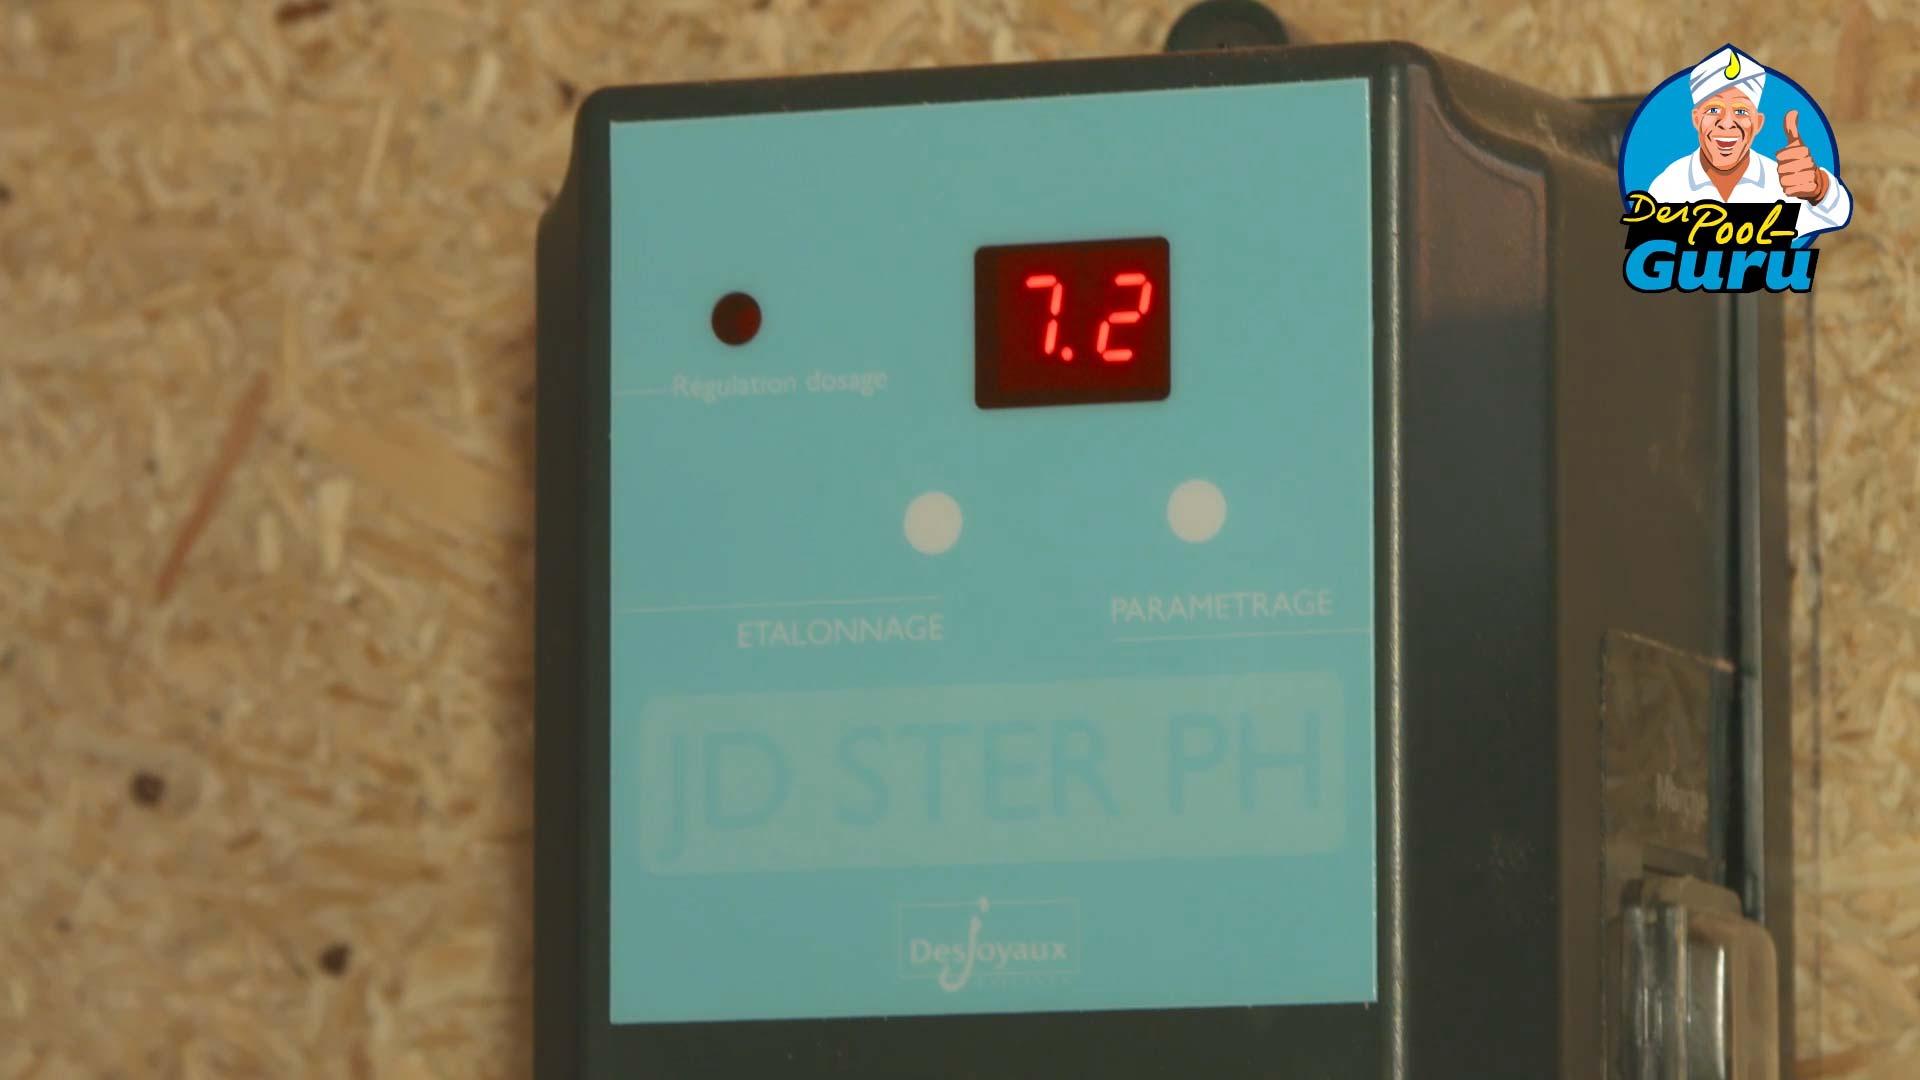 Swimmingpool PH-Wert Messung automatische Wasseraufbereitung